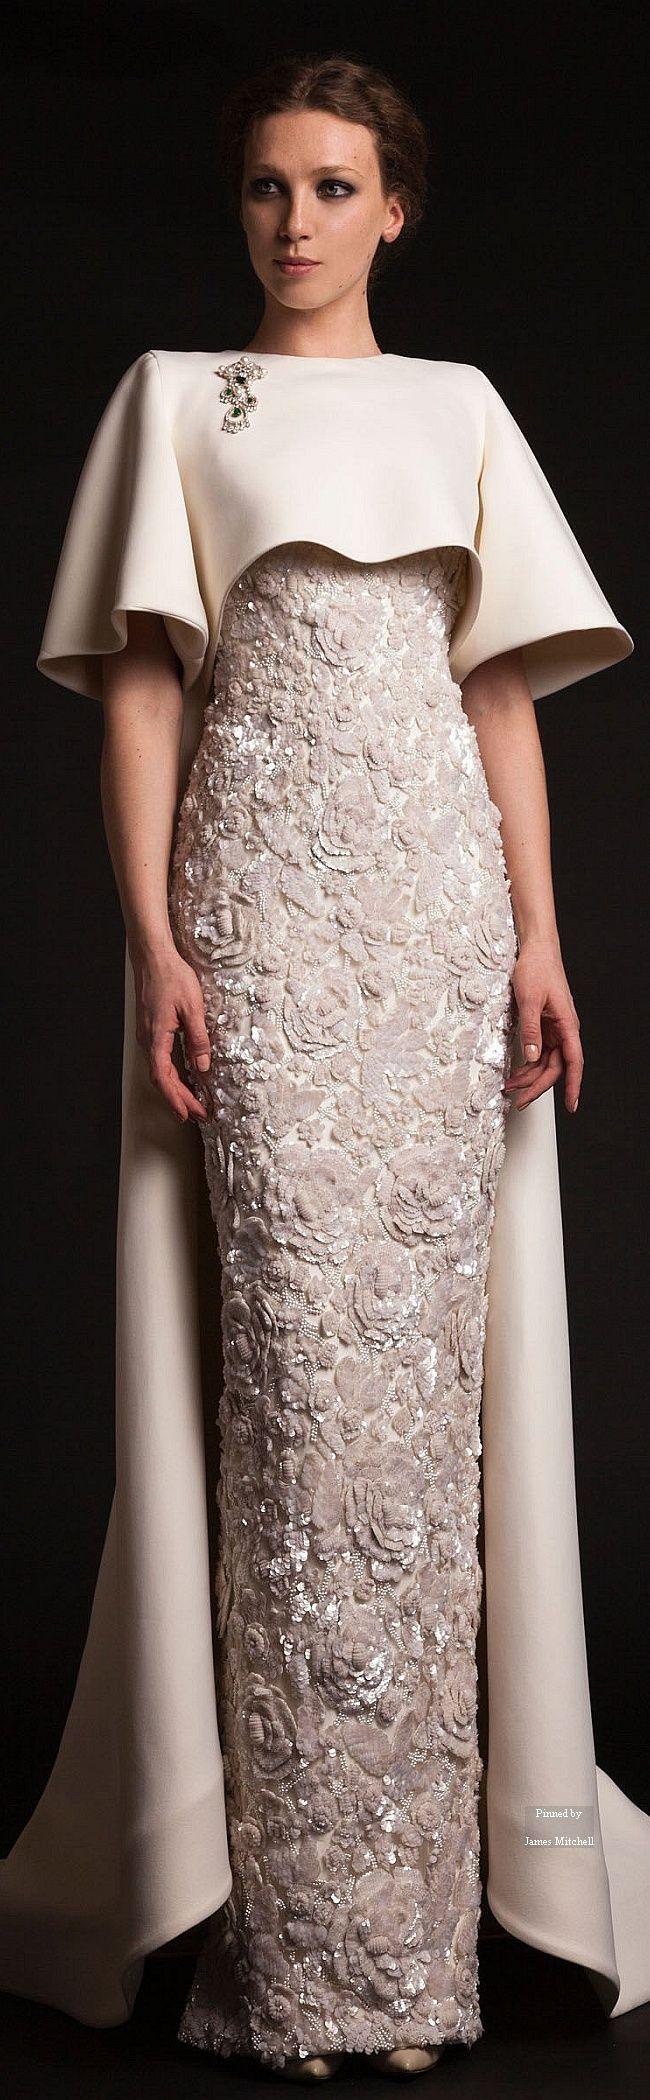 Mili Orihuela Pinterest 2018 Mode Y Abendkleid De Dolor Pin Kleider En wTOA5q